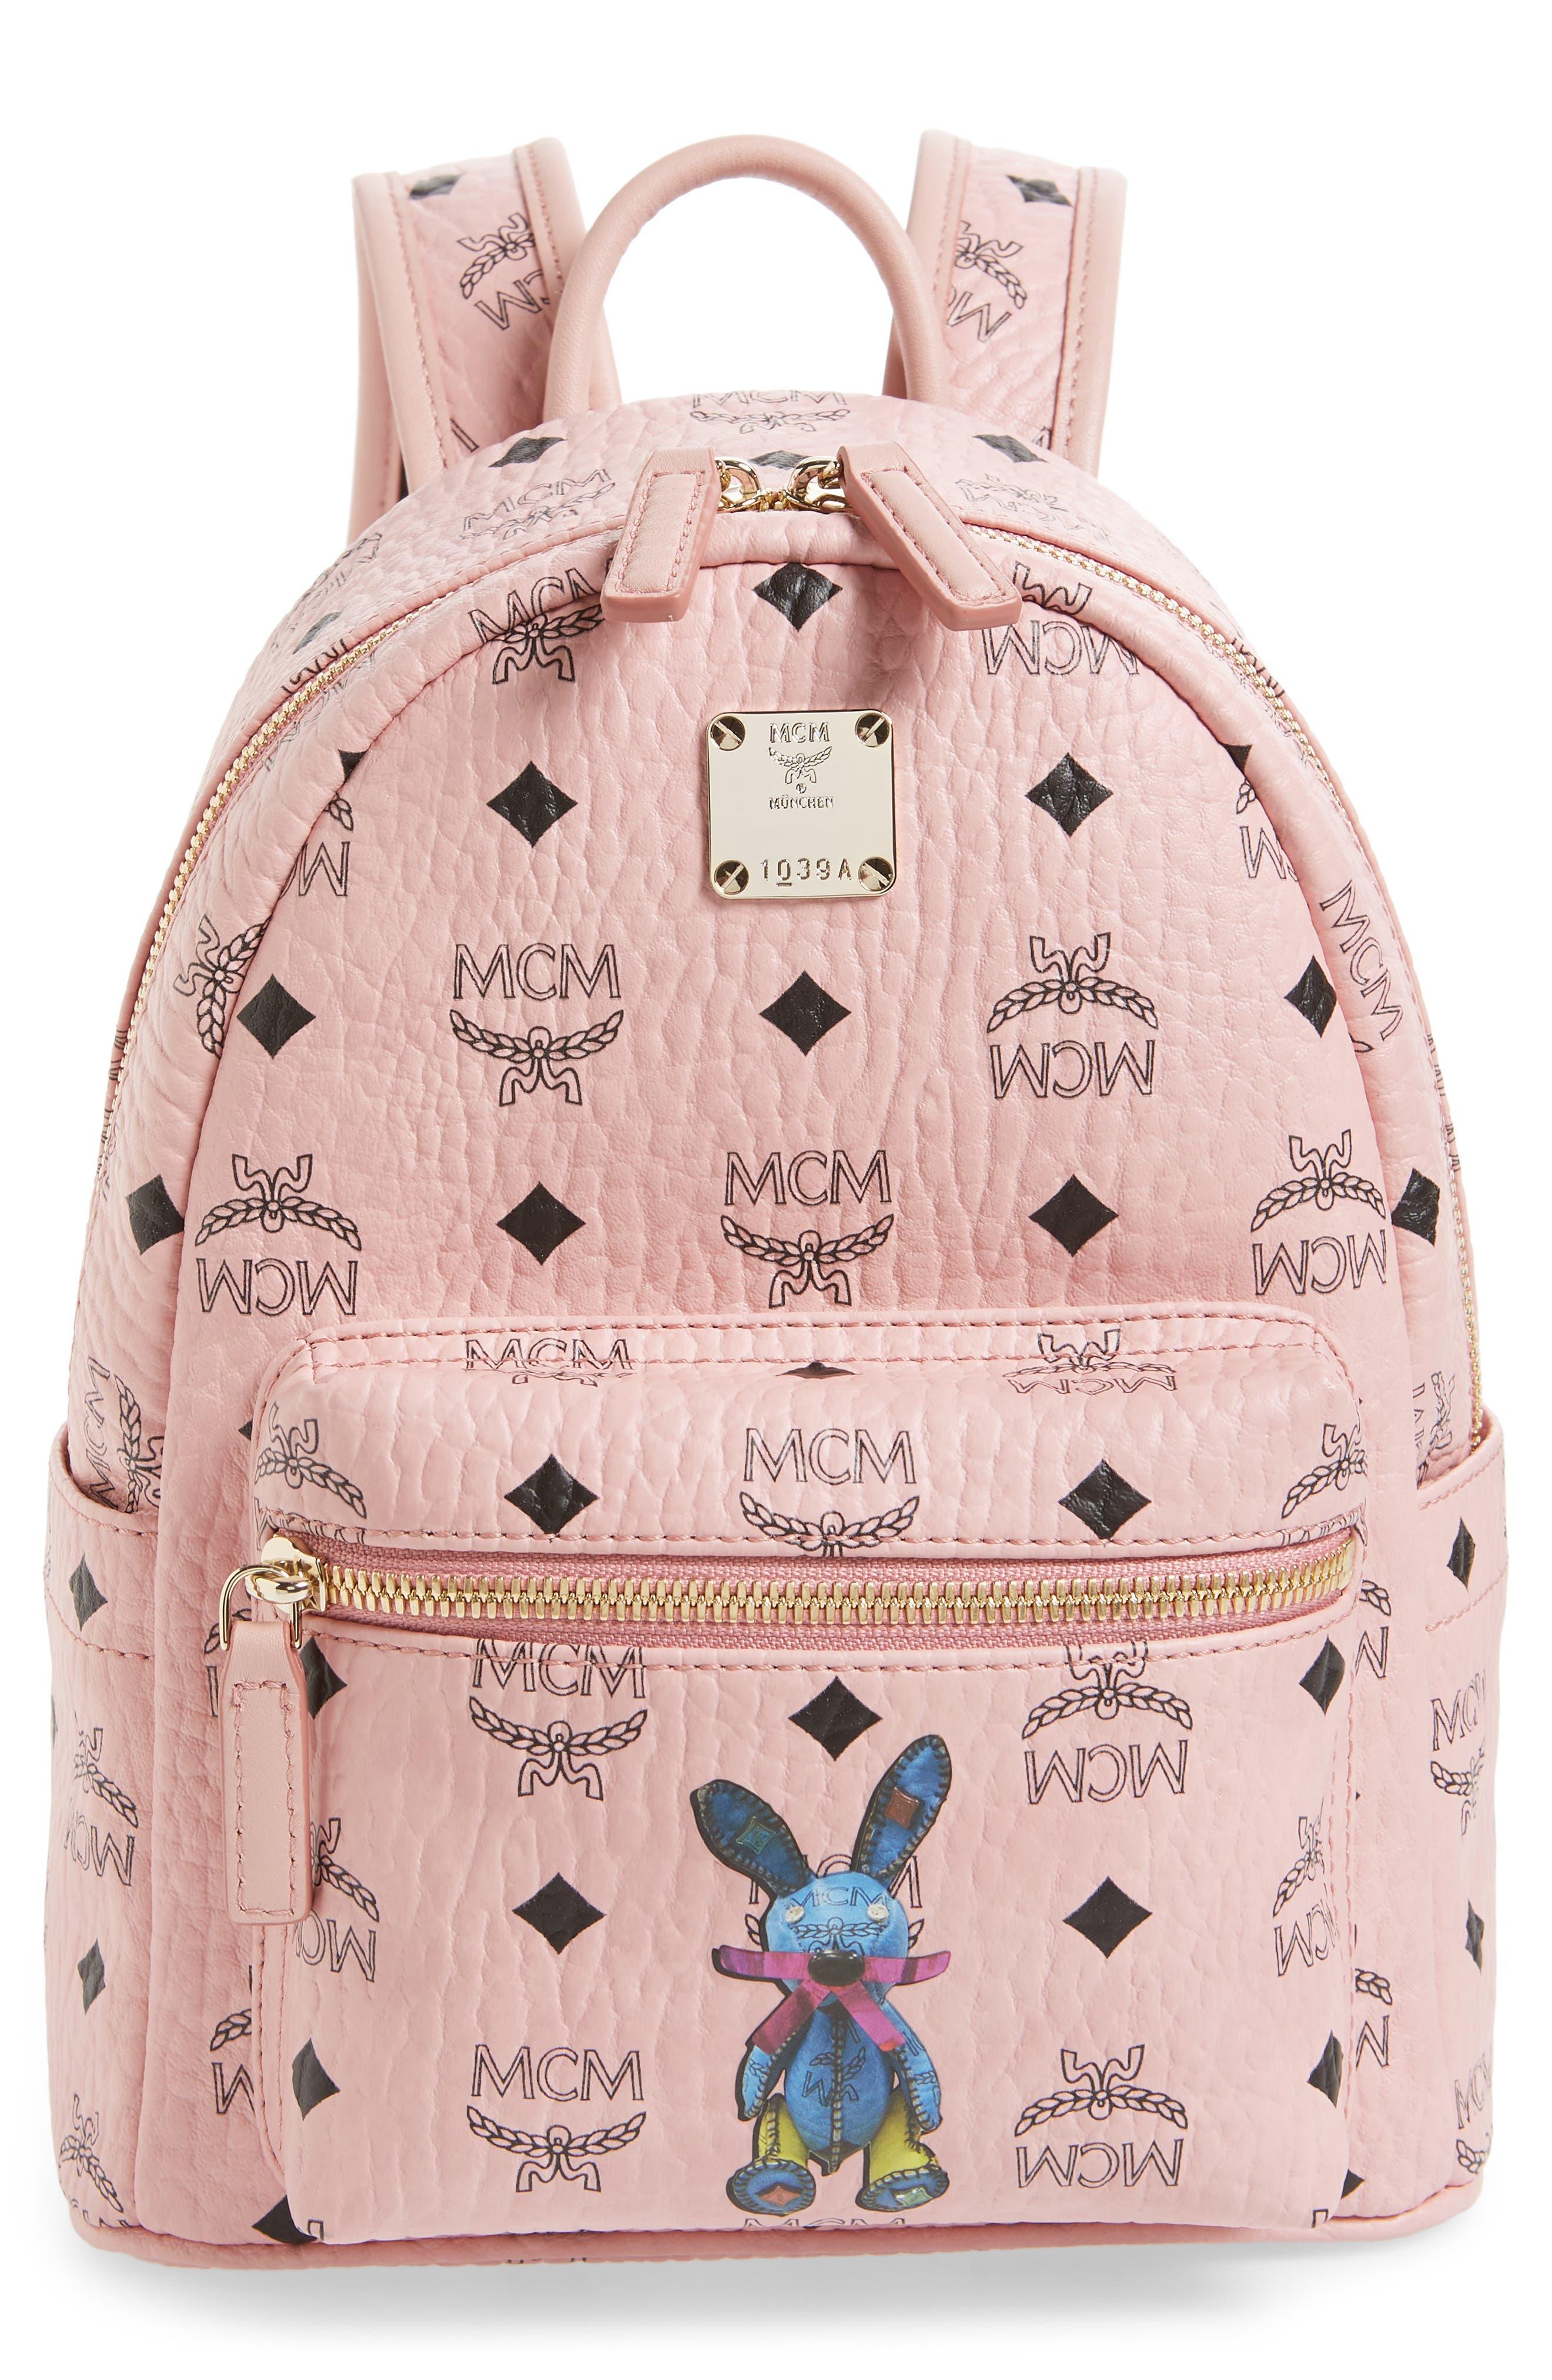 Rabbit Mini Coated Canvas Backpack,                             Main thumbnail 1, color,                             650